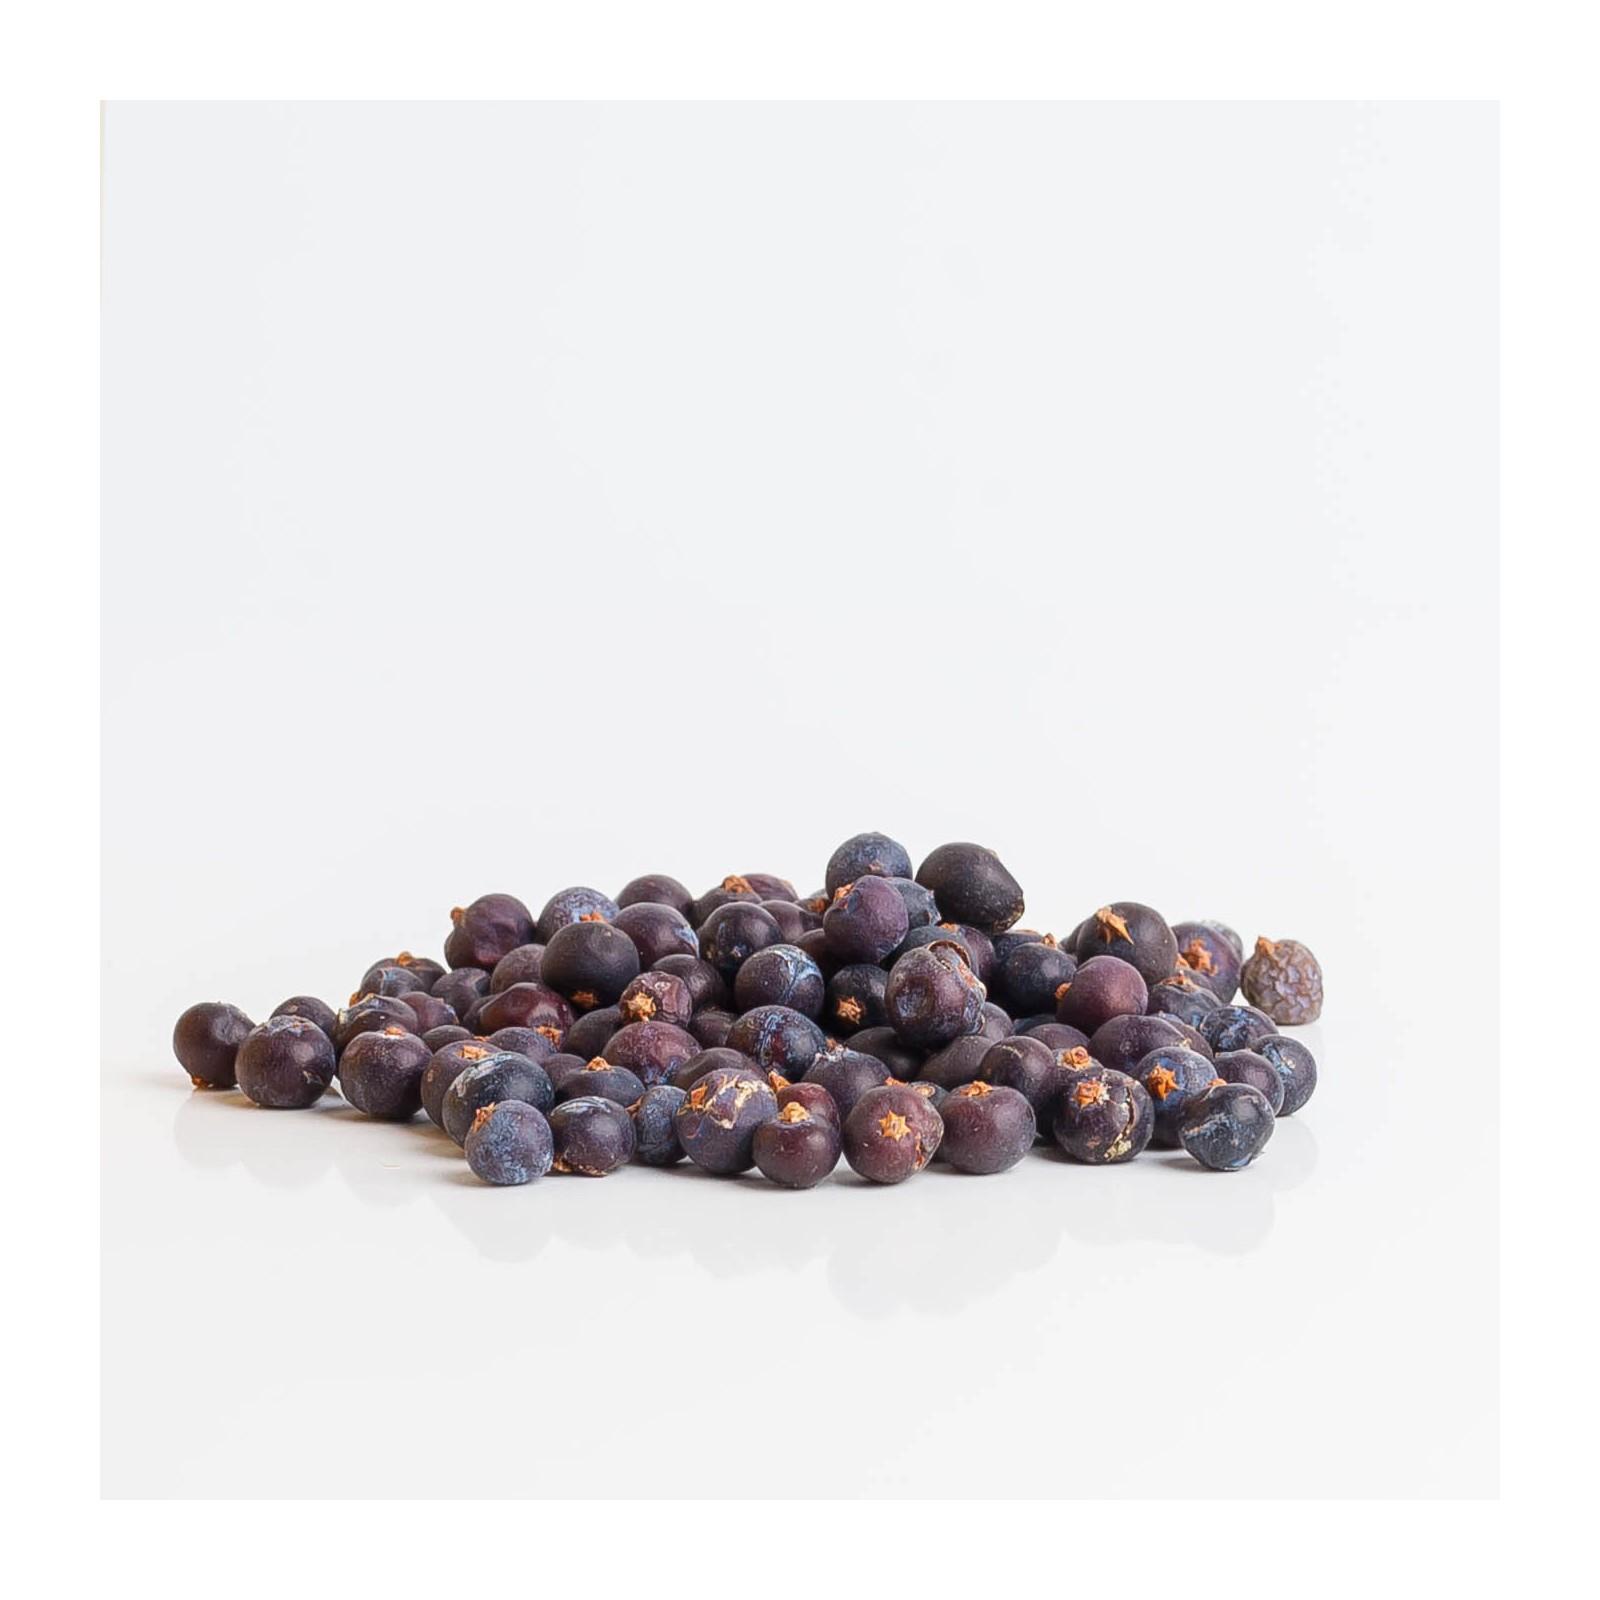 Wacholder - plantes condimentaires